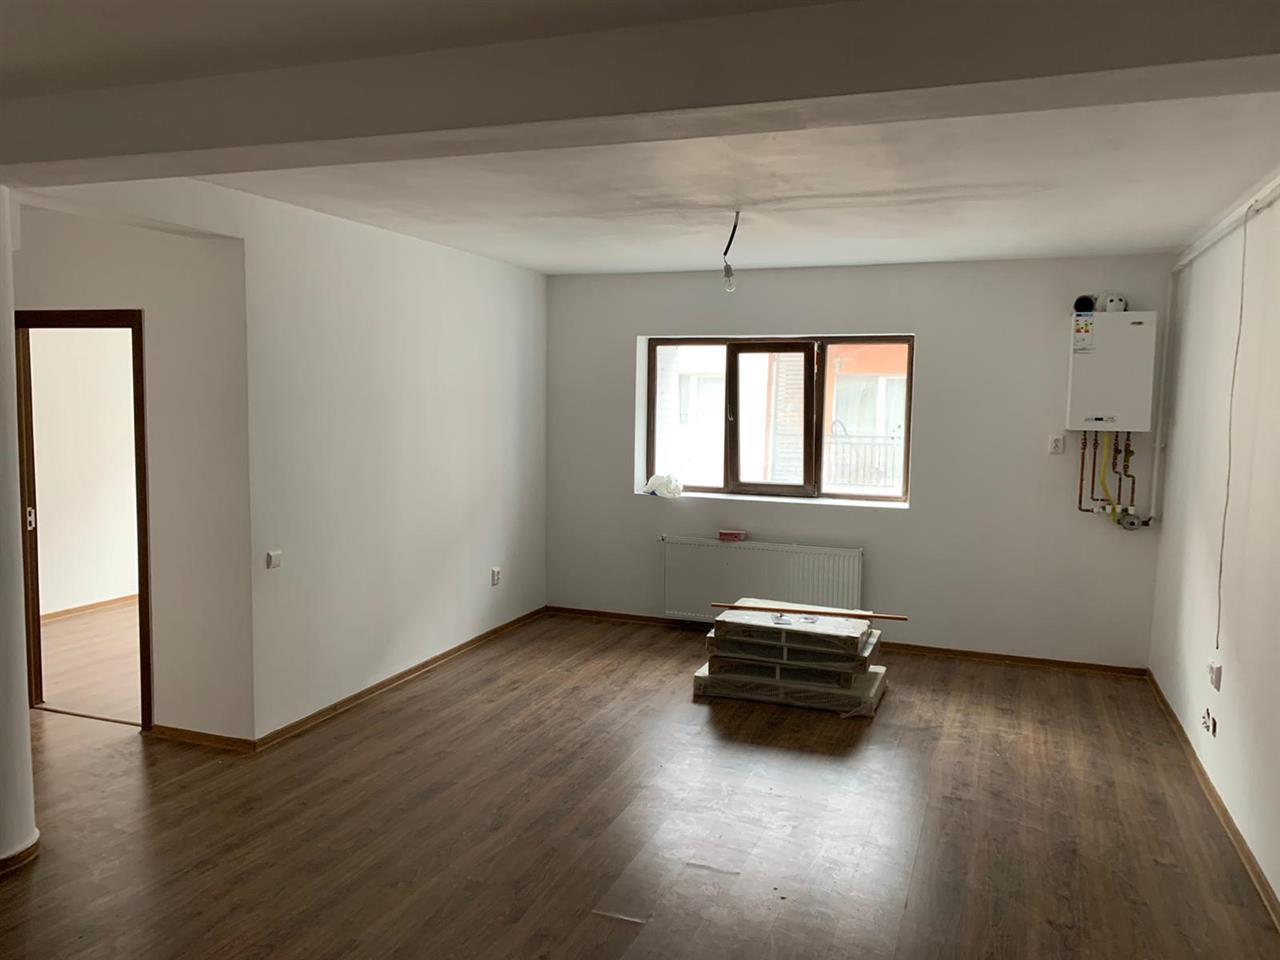 3 camere, Manastur, etaj intermediar 78 mp,finisat, zona Roata Faget